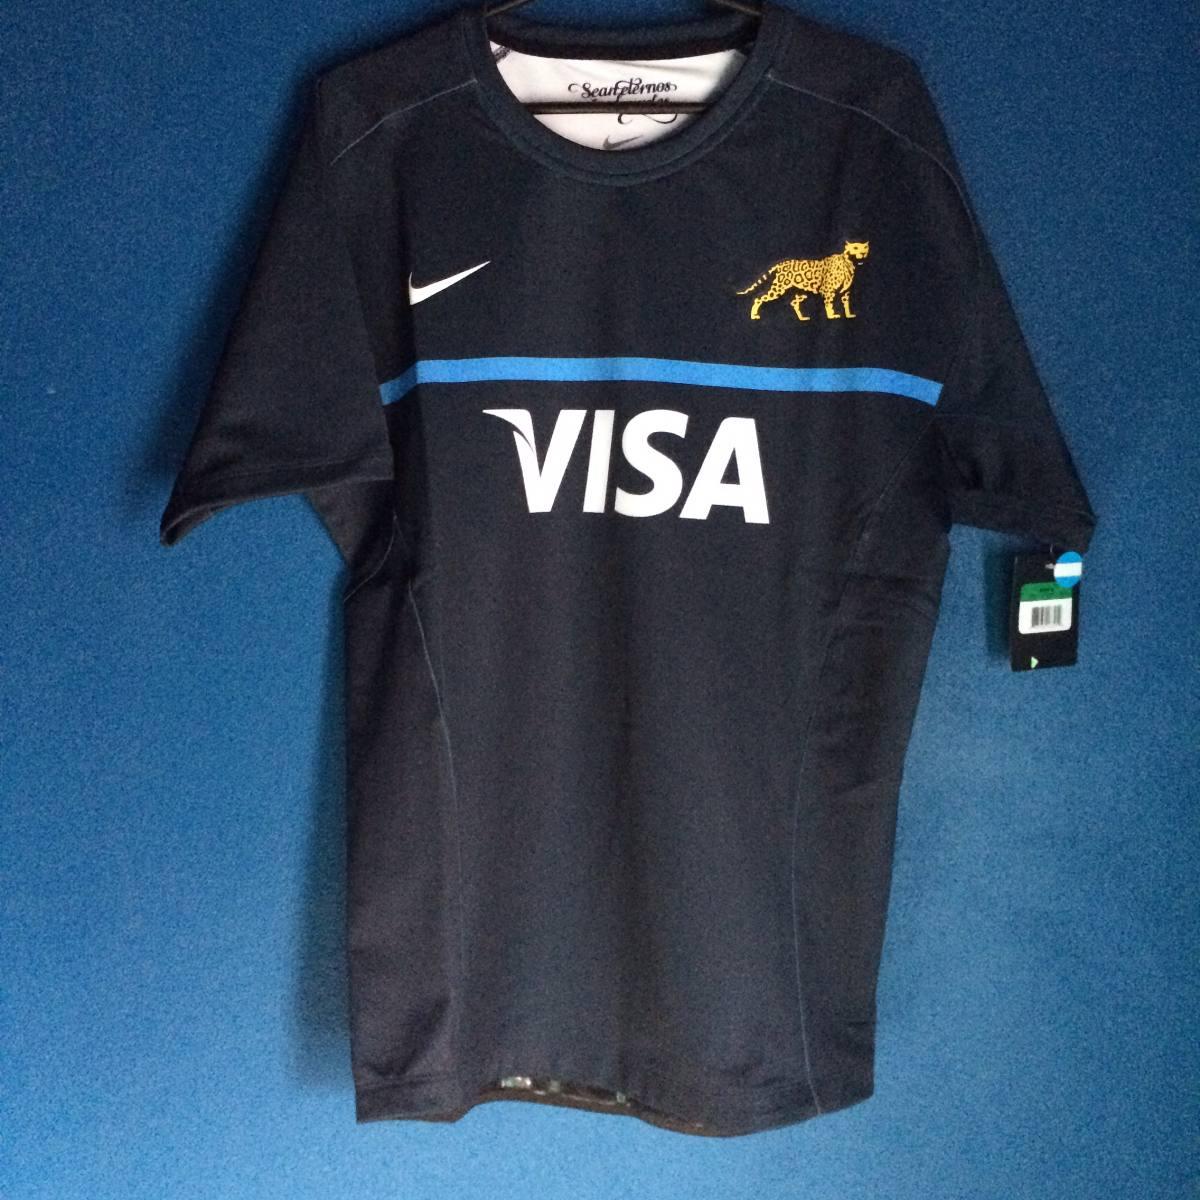 Original En 00 Nike 100 Entrenamiento Camiseta Uar Pumas 800 wX8aFq4x